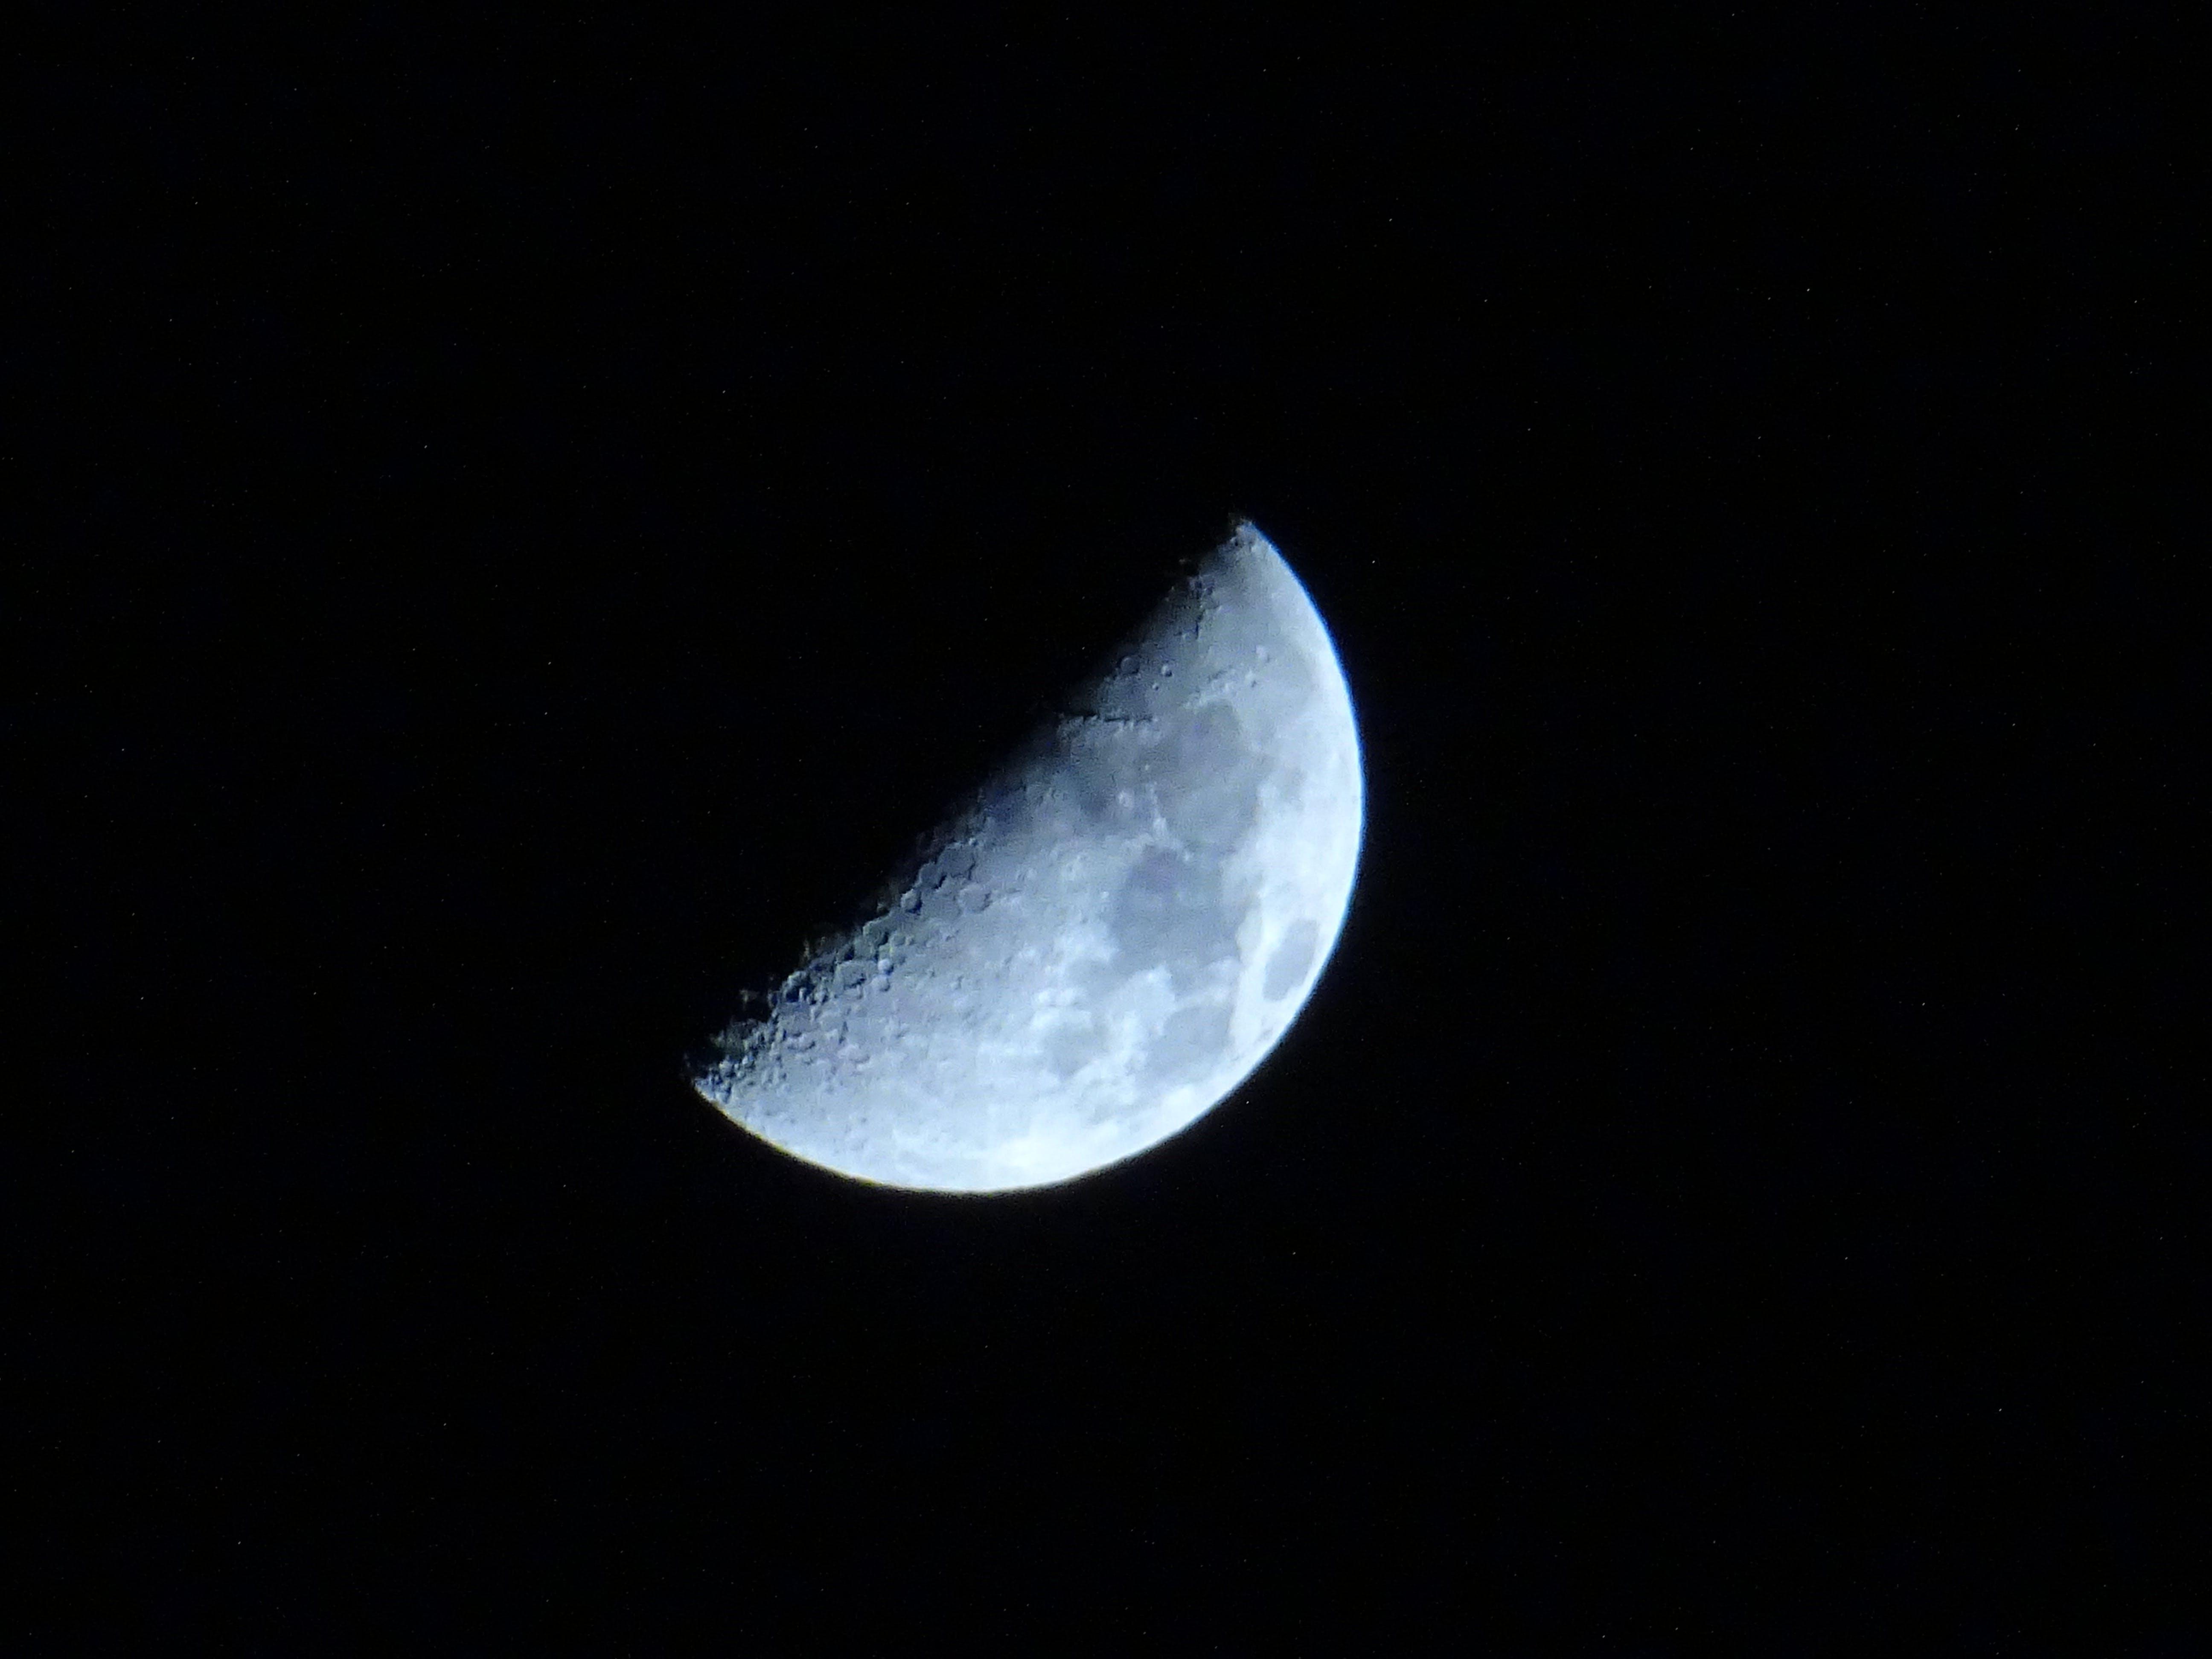 Free stock photo of night, dark, evening, moon